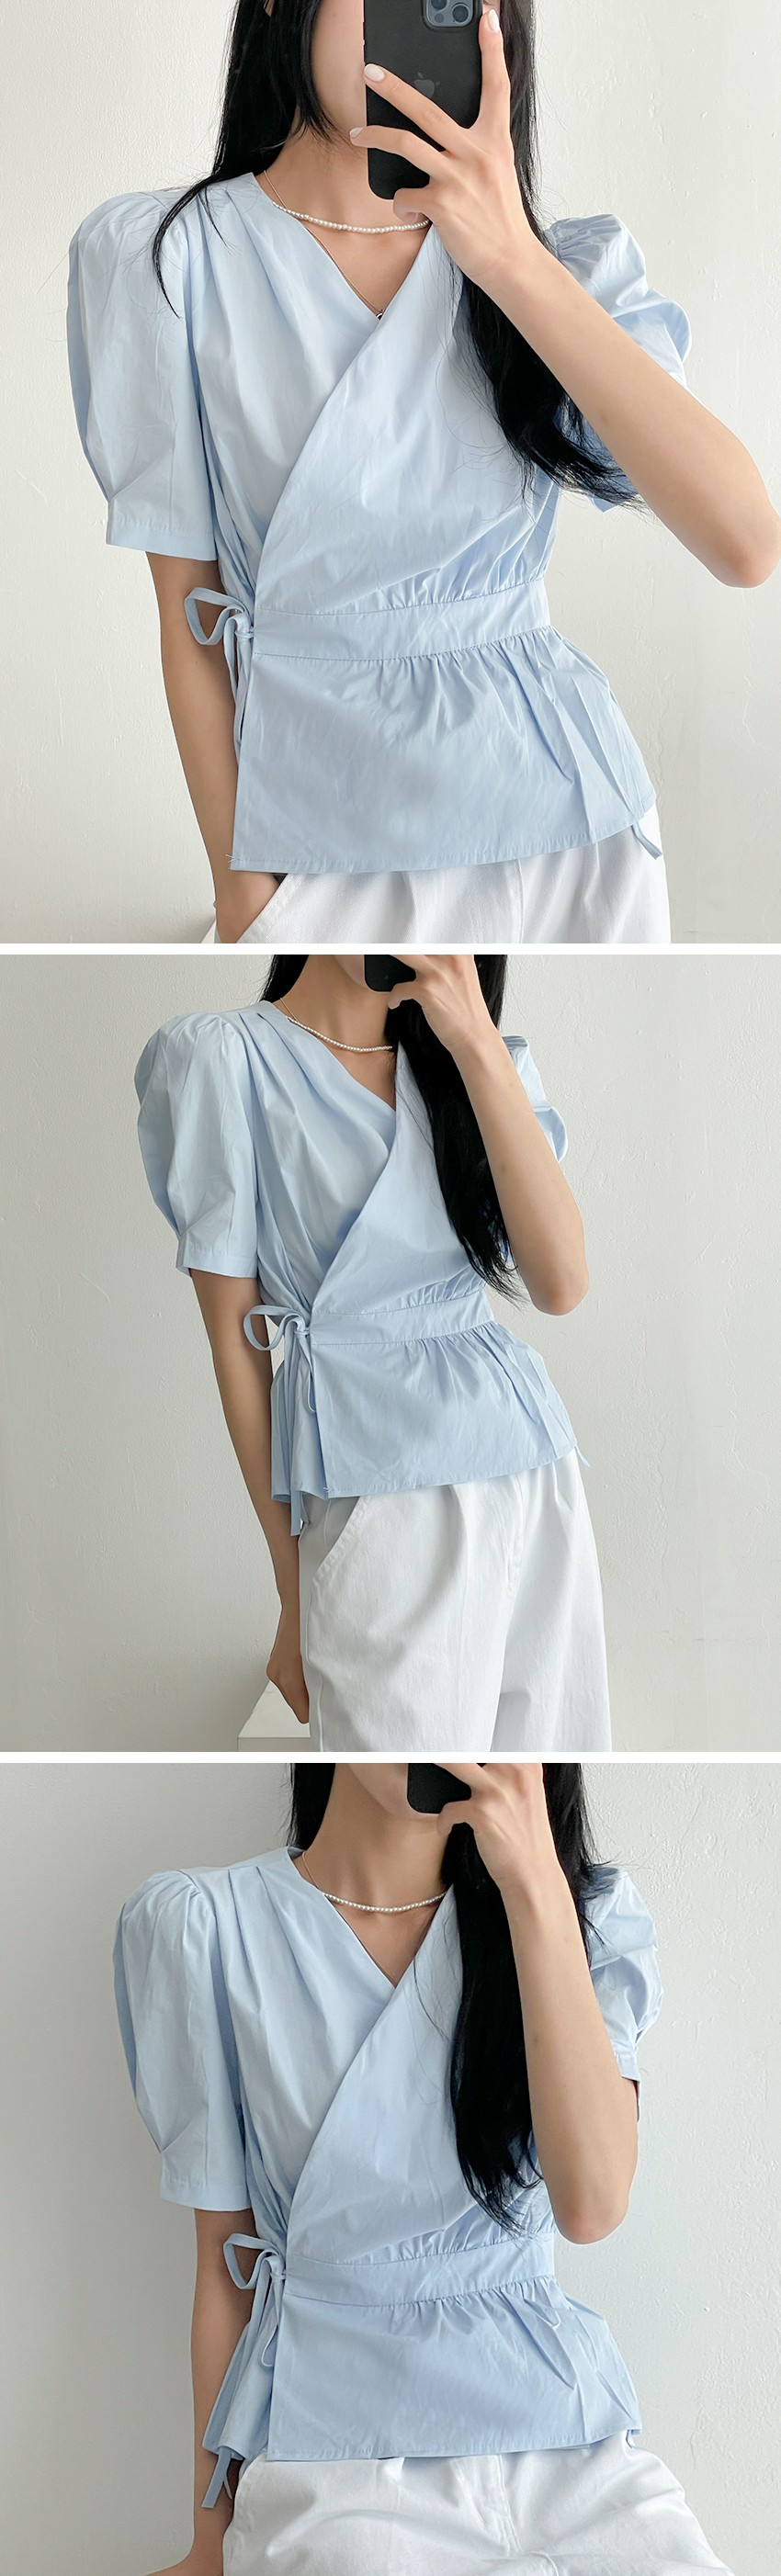 puff wrap pastel shirring Loose-fit short sleeve blouse